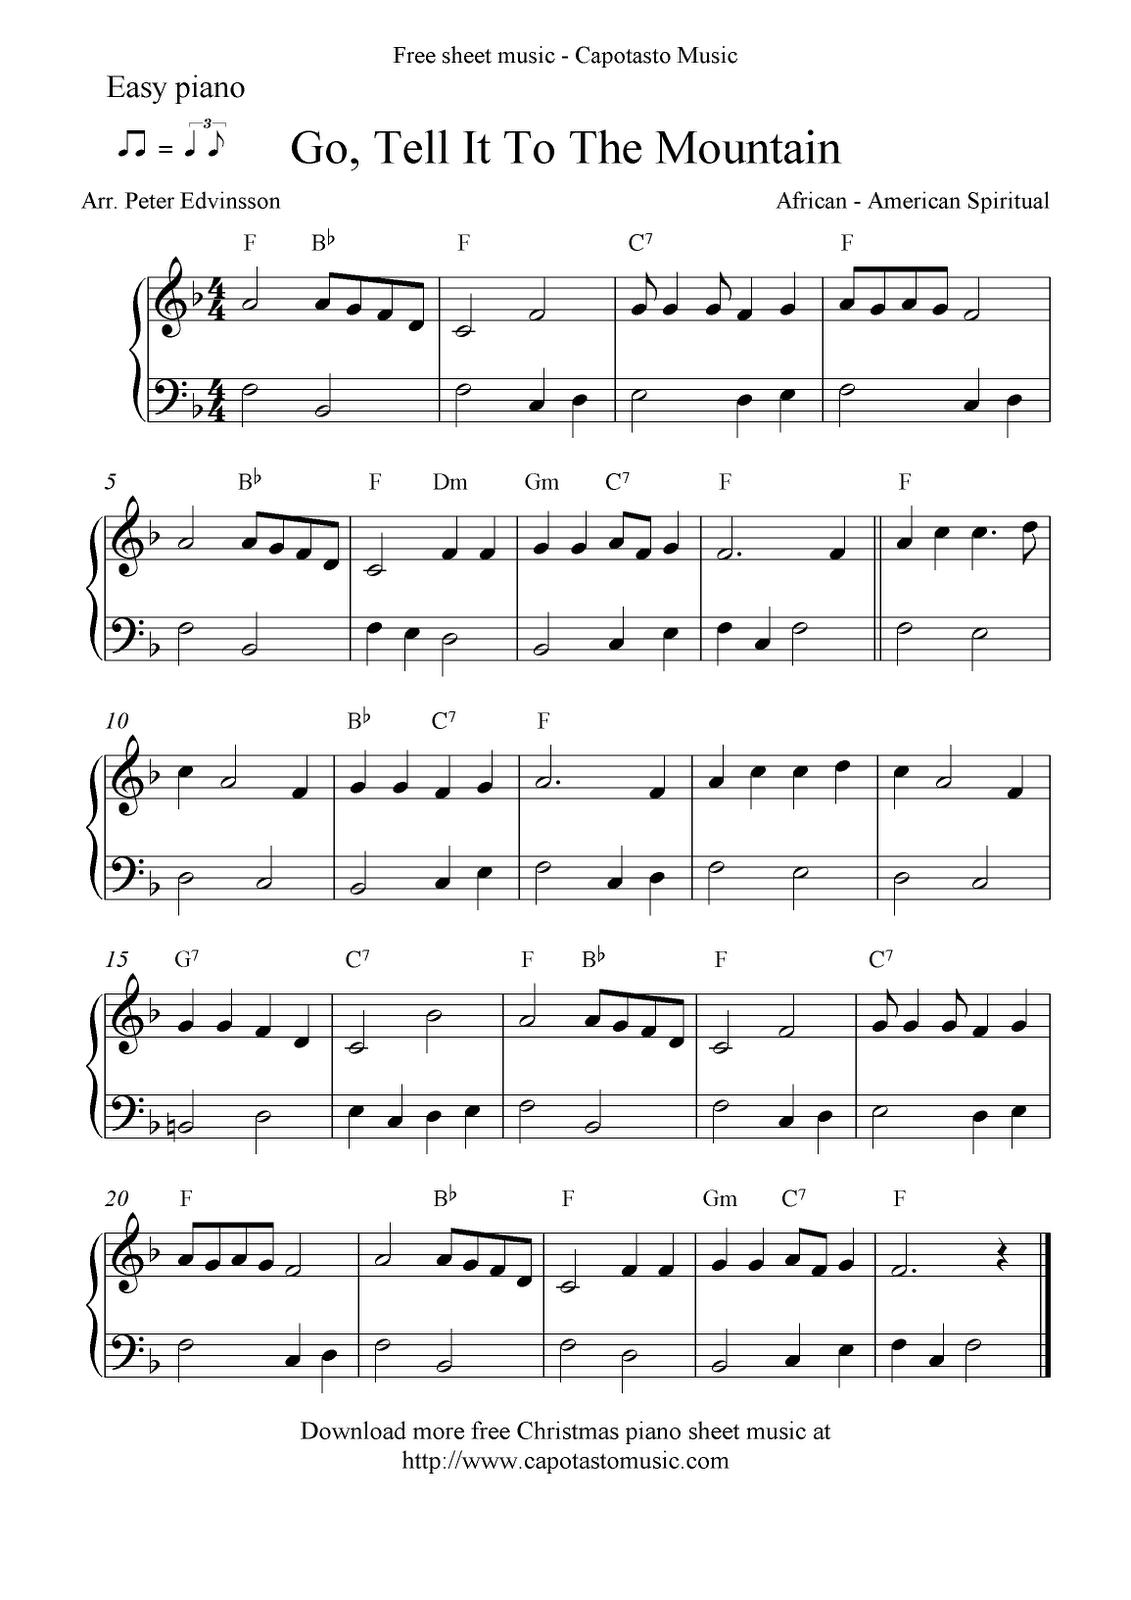 Free Printable Piano Sheet Music | Free Sheet Music Scores: Easy - Free Printable Frosty The Snowman Sheet Music